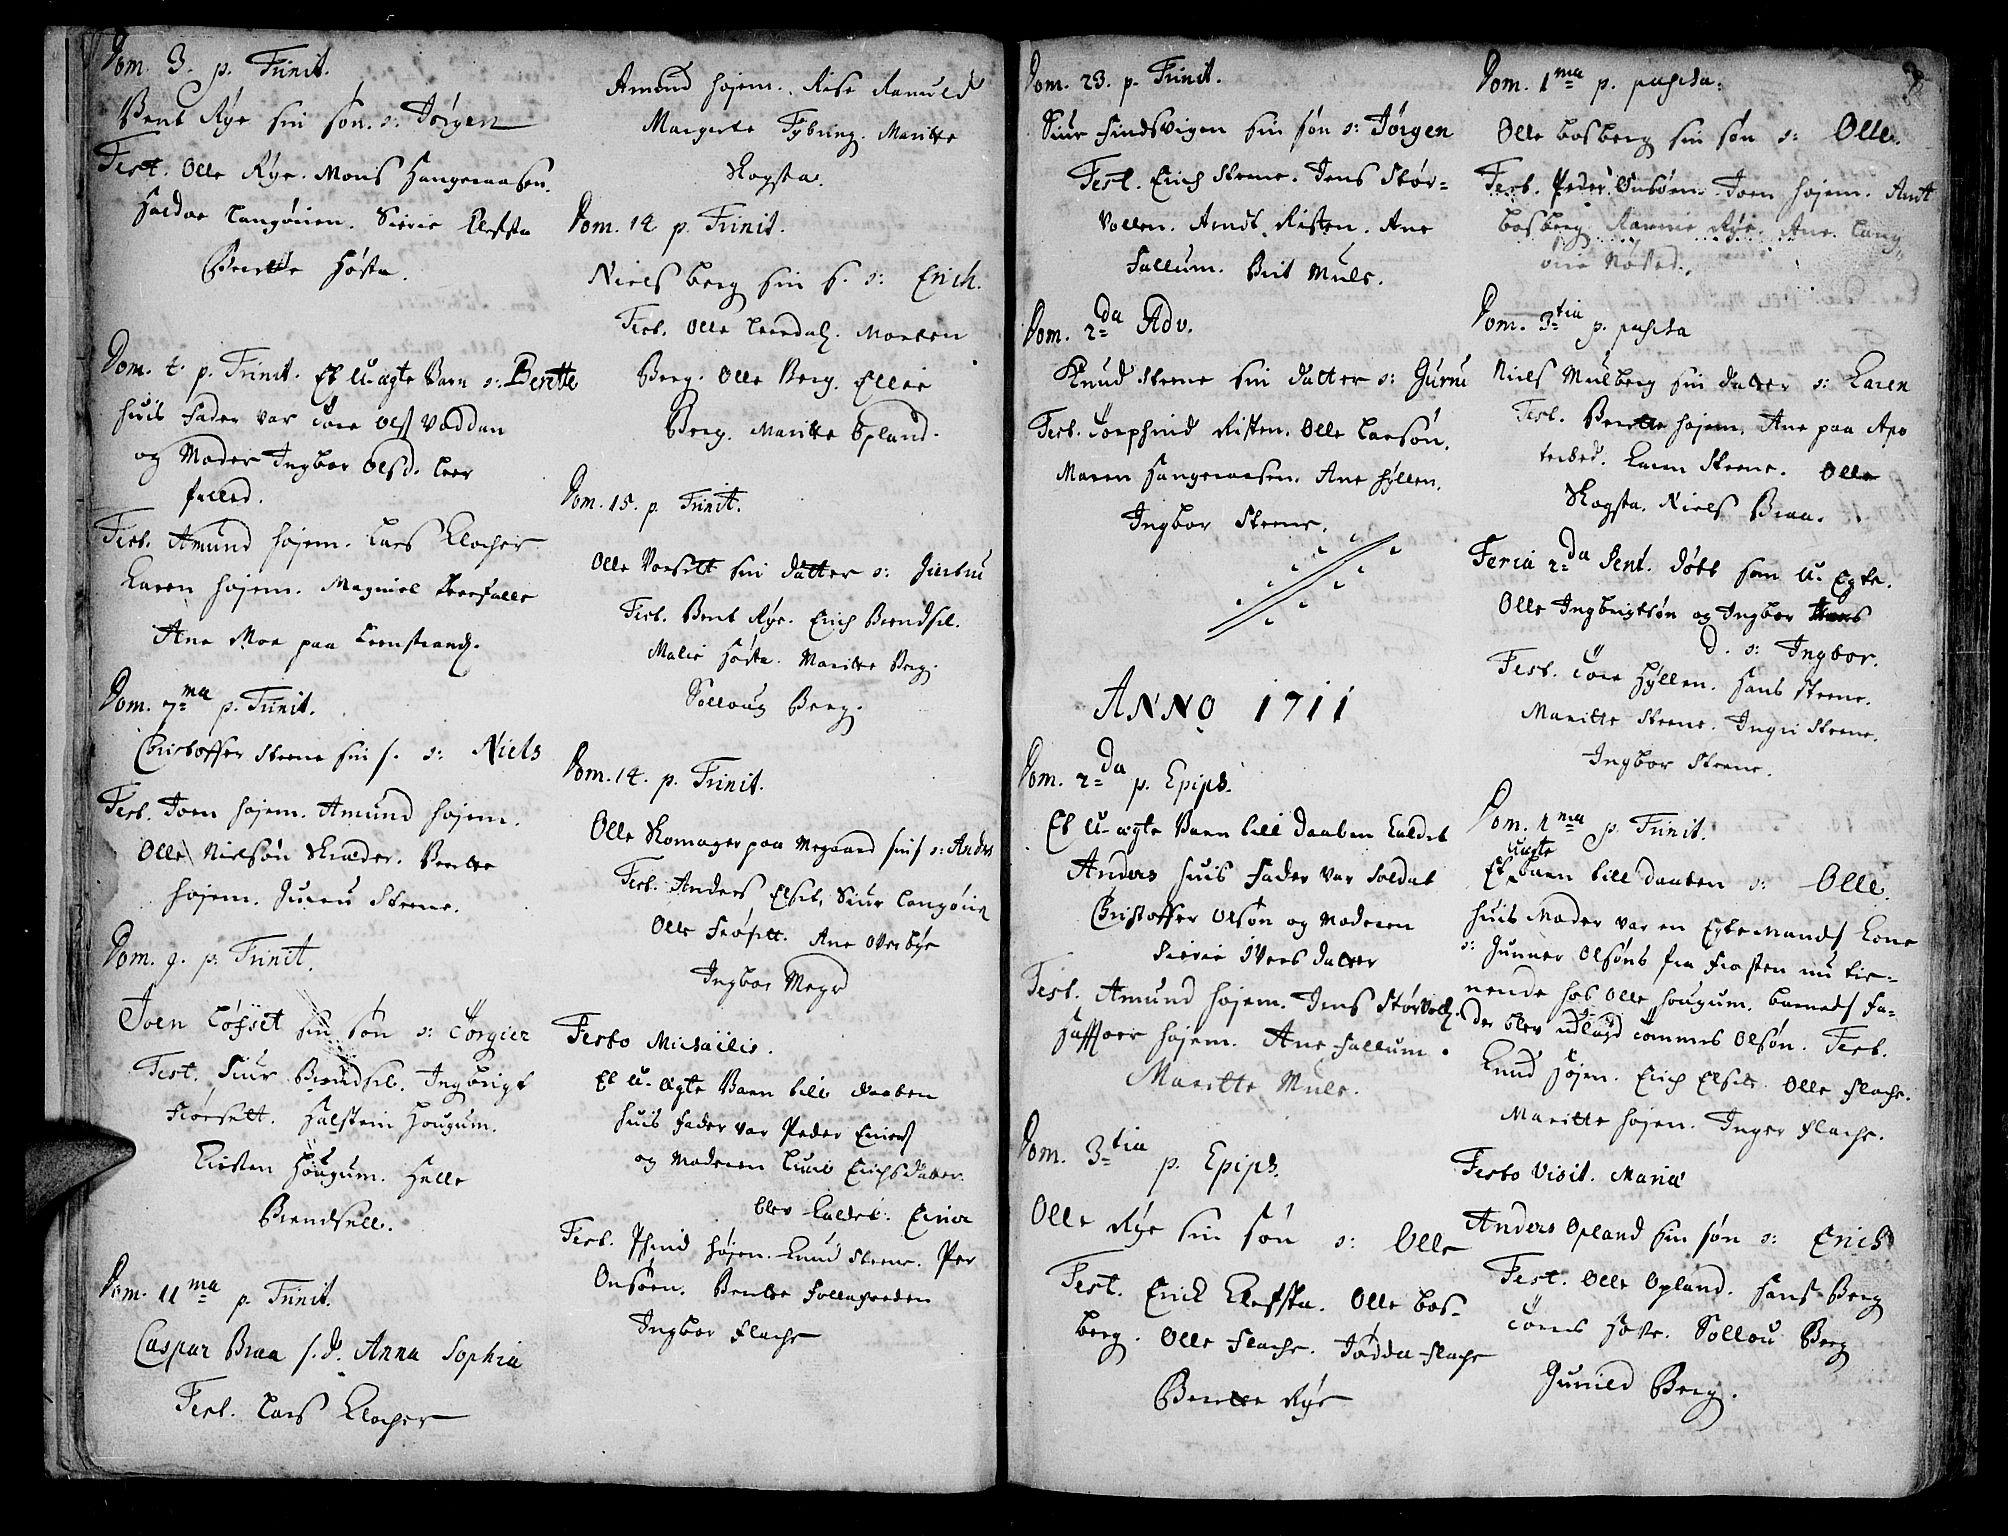 SAT, Ministerialprotokoller, klokkerbøker og fødselsregistre - Sør-Trøndelag, 612/L0368: Parish register (official) no. 612A02, 1702-1753, p. 8